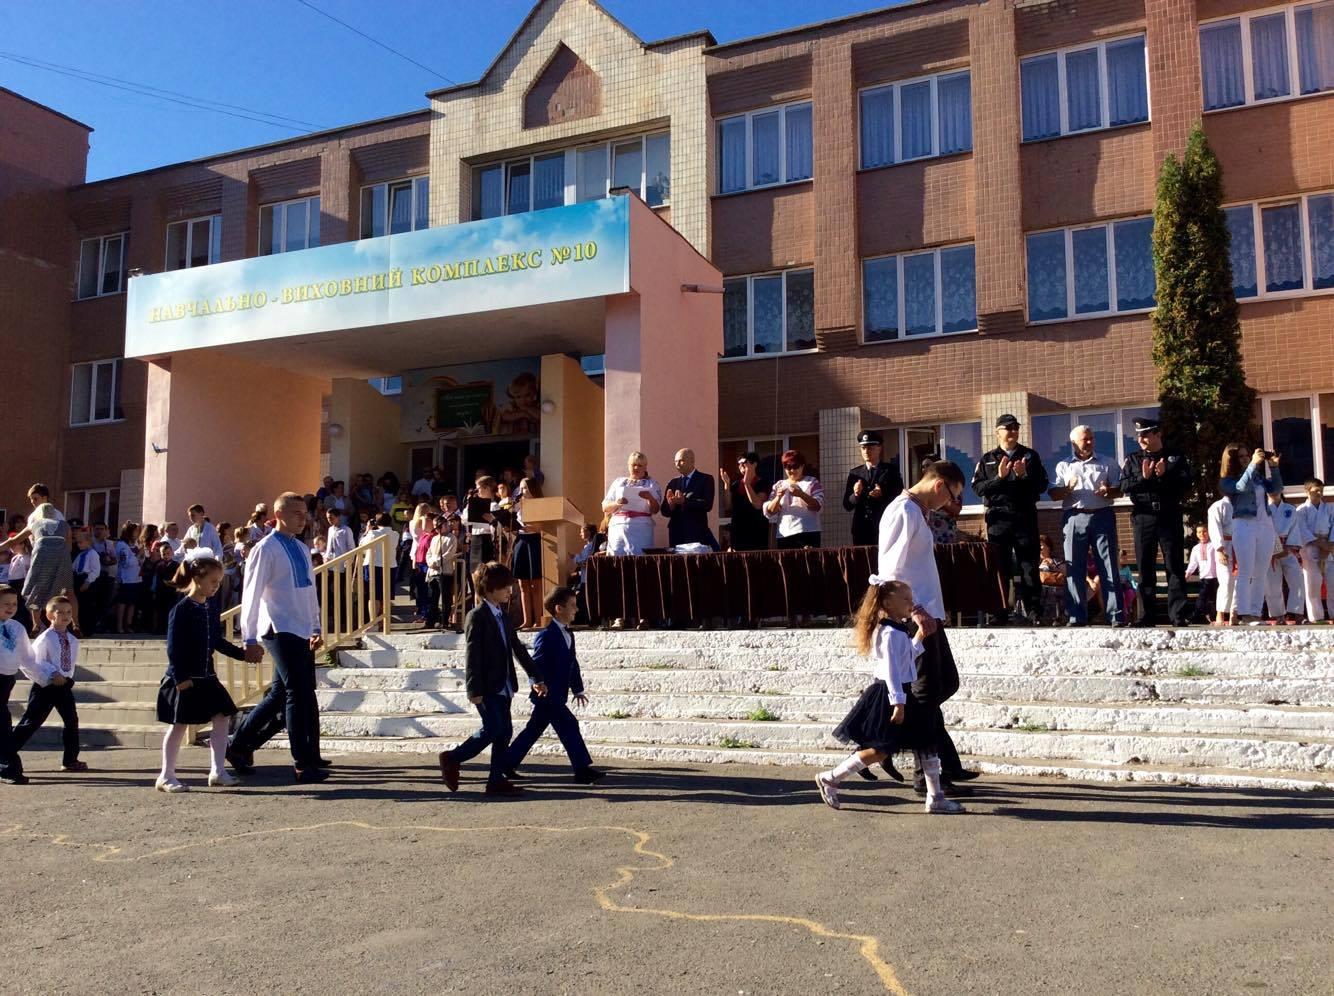 Хмельницький НВК№10 на Першовересень заполонили поліцейські - фото 5